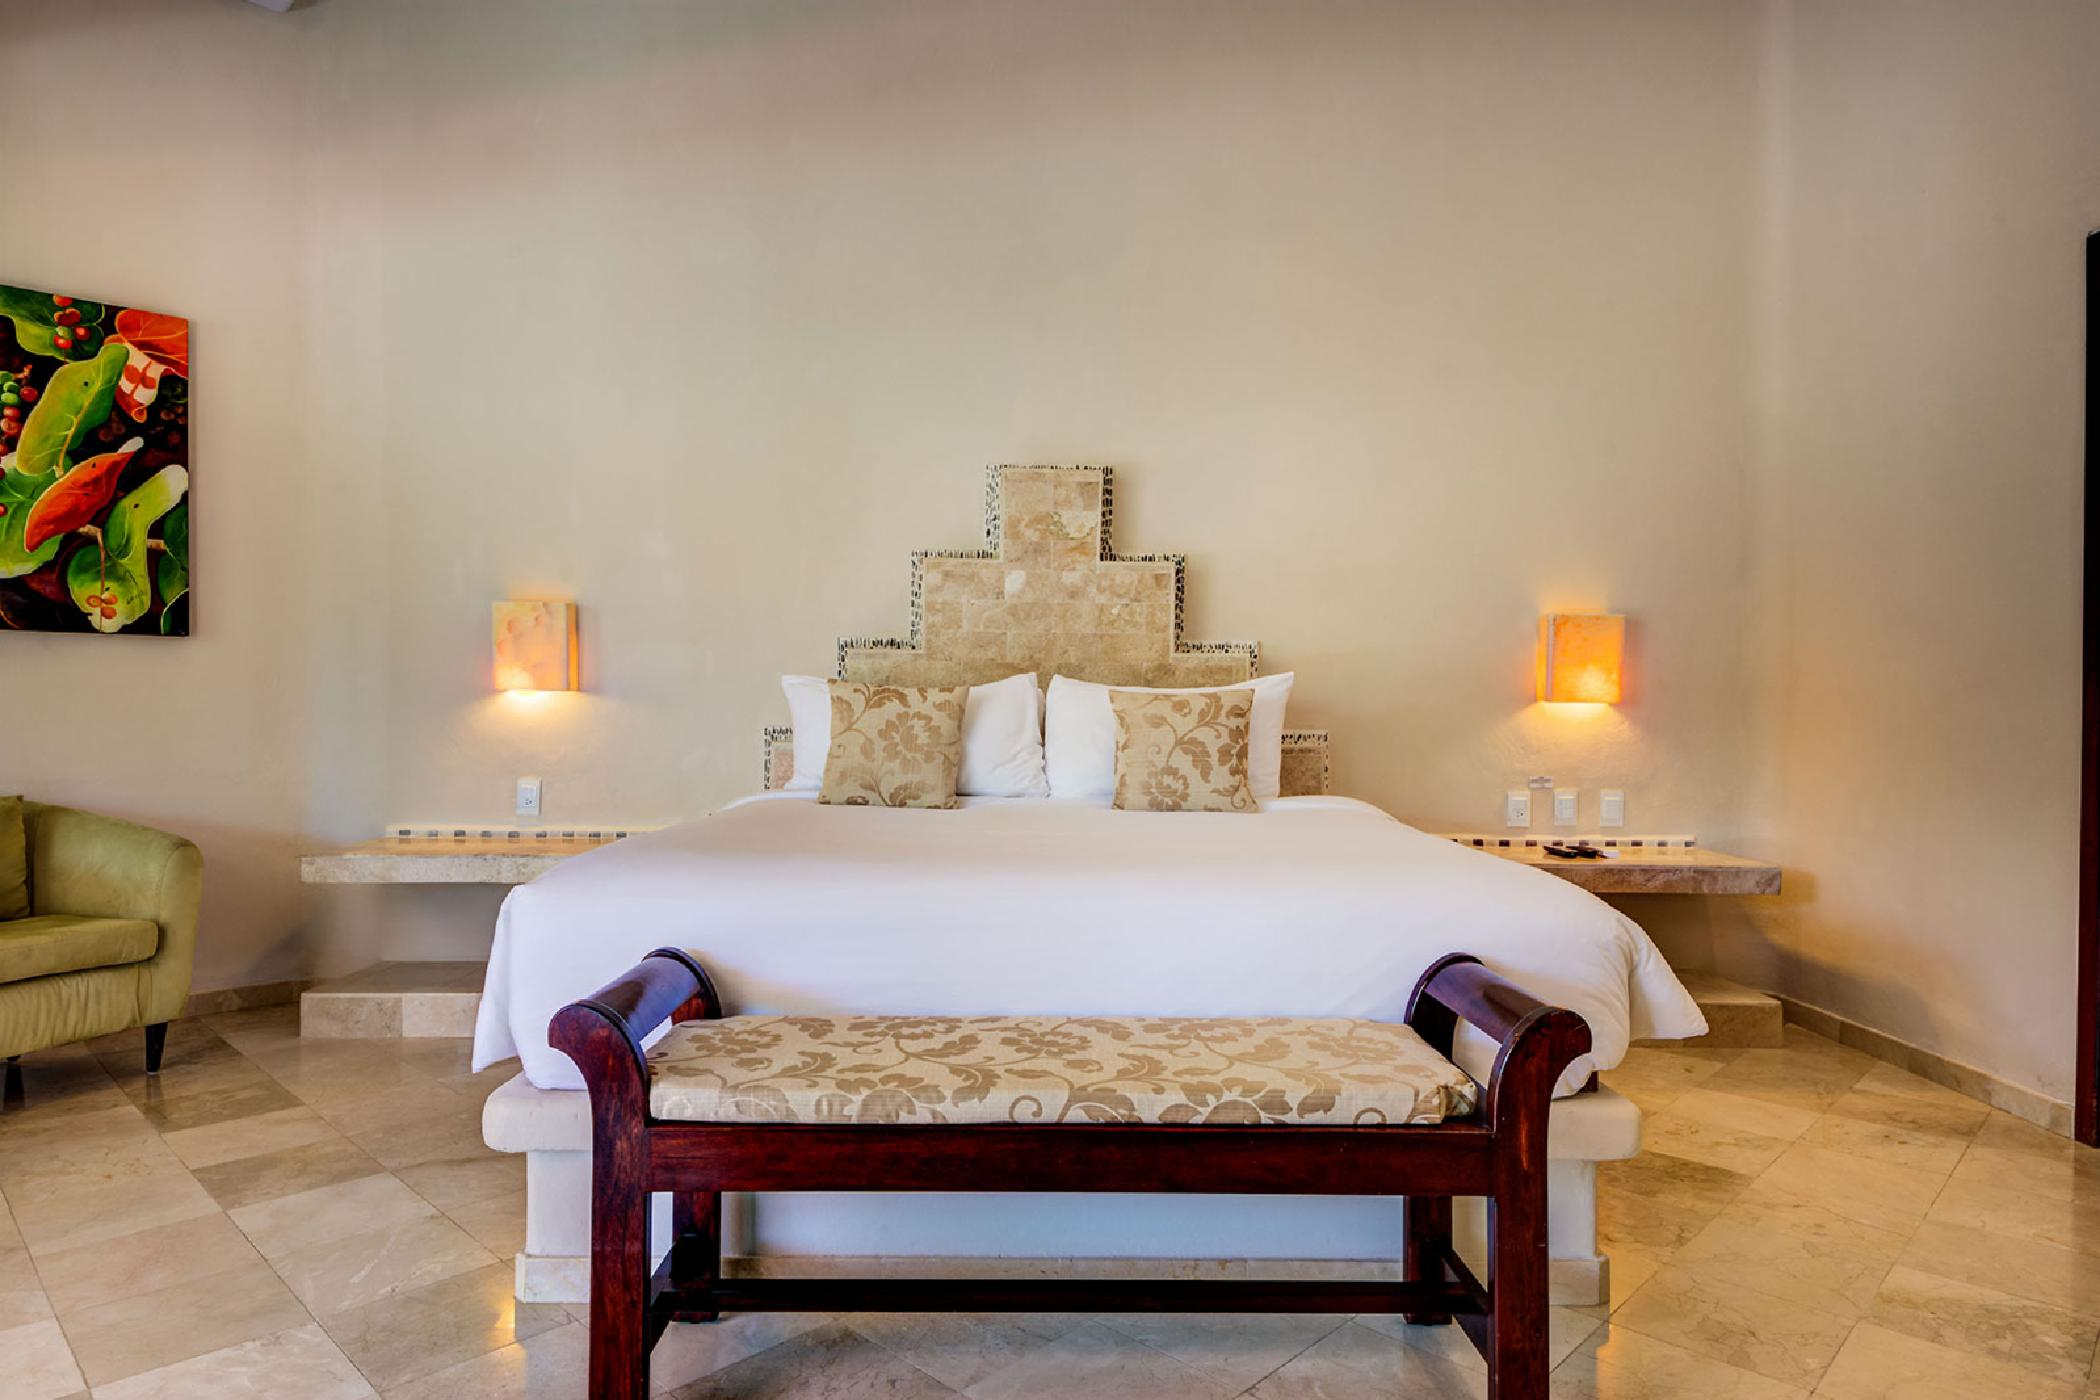 Agents_Maya_Luxe_Riviera_Maya_Luxury_Villas_Casa_Yardena15.jpg